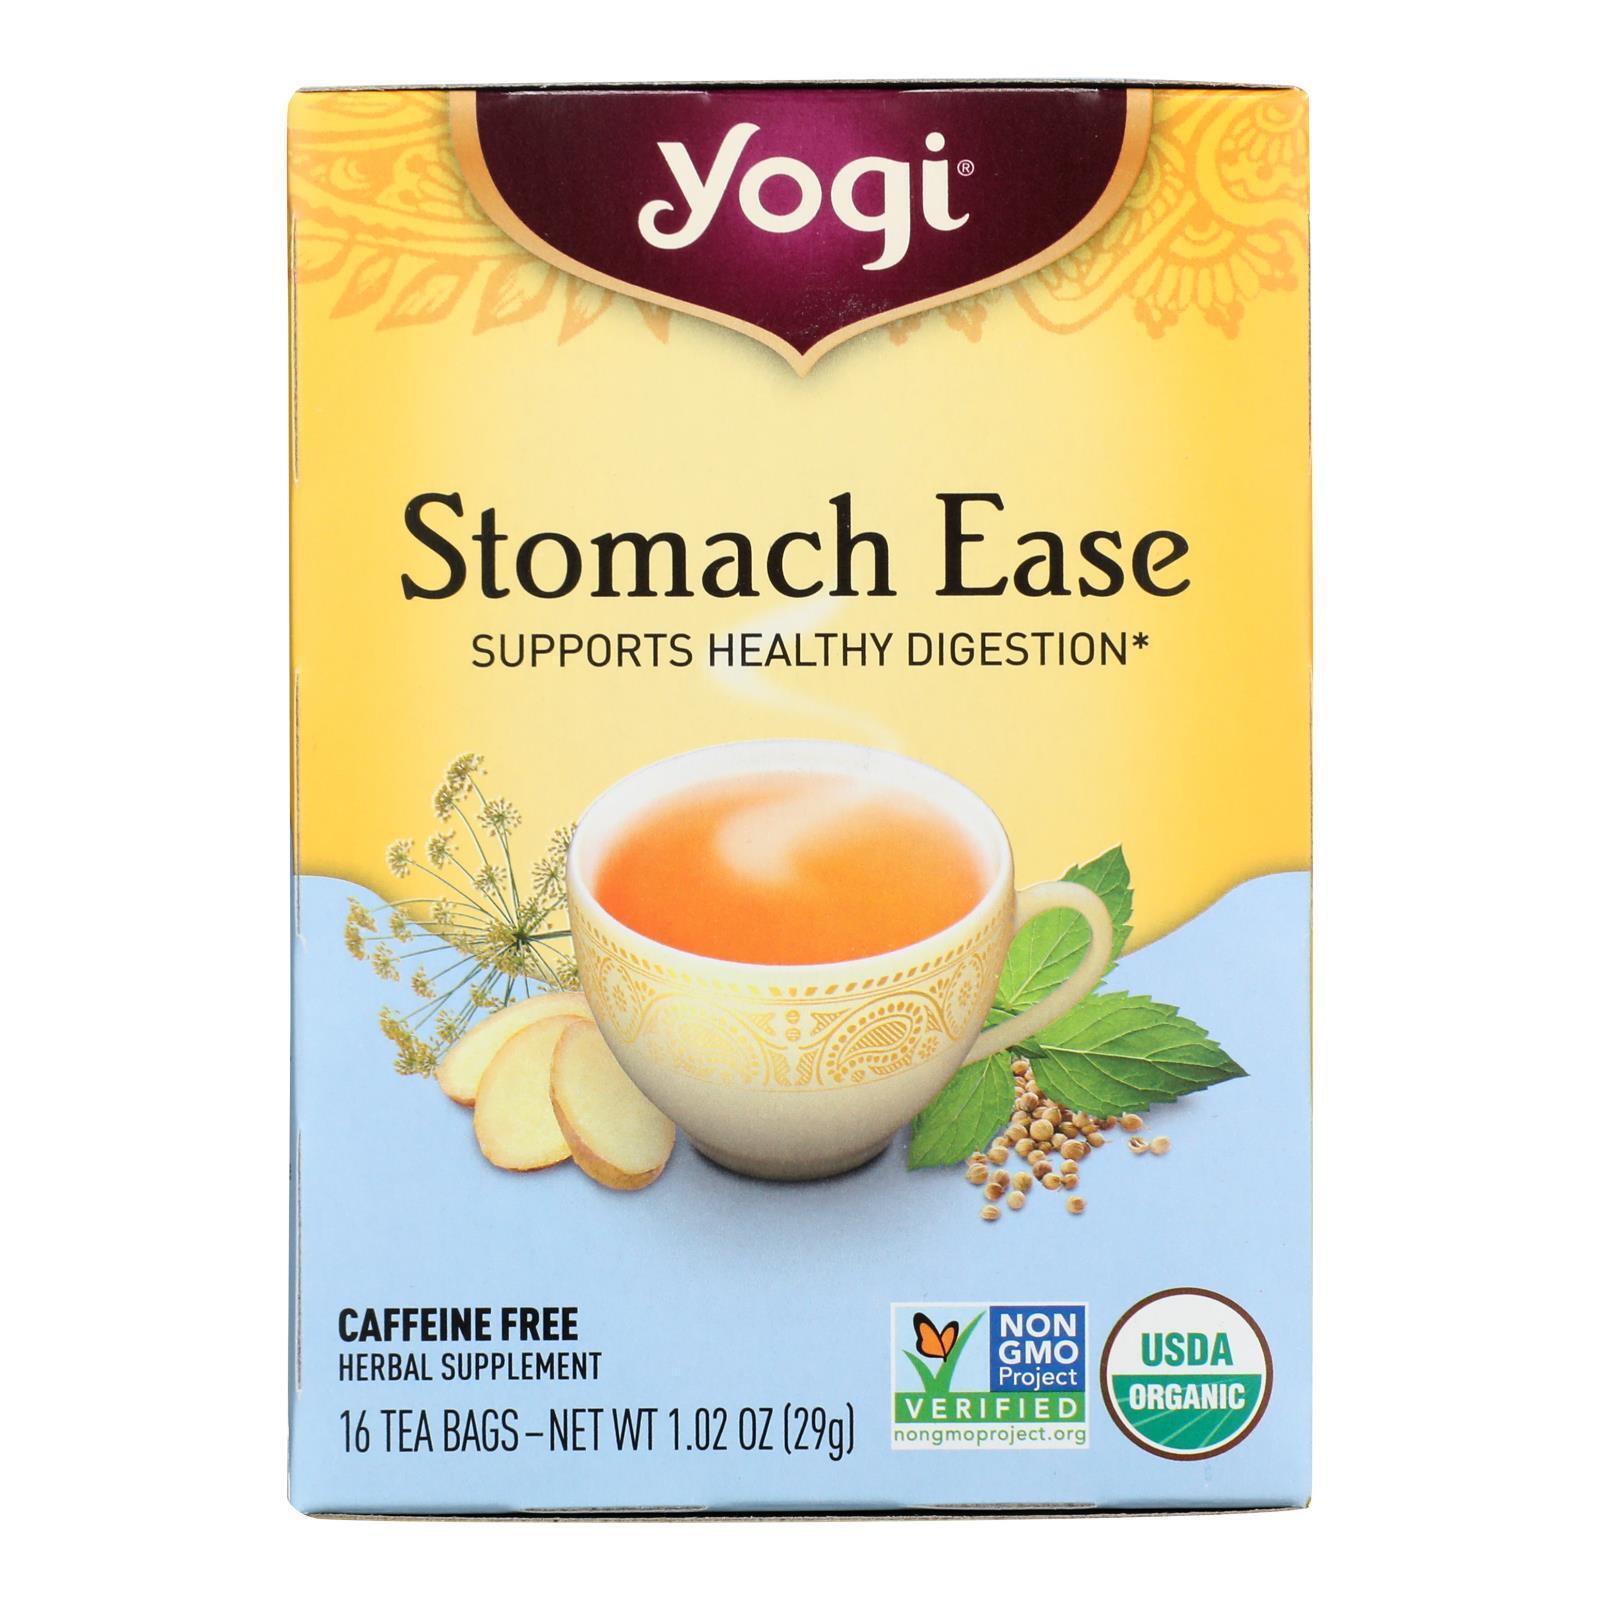 Yogi Tea Stomach Ease - Caffeine Free - 16 Tea Bags